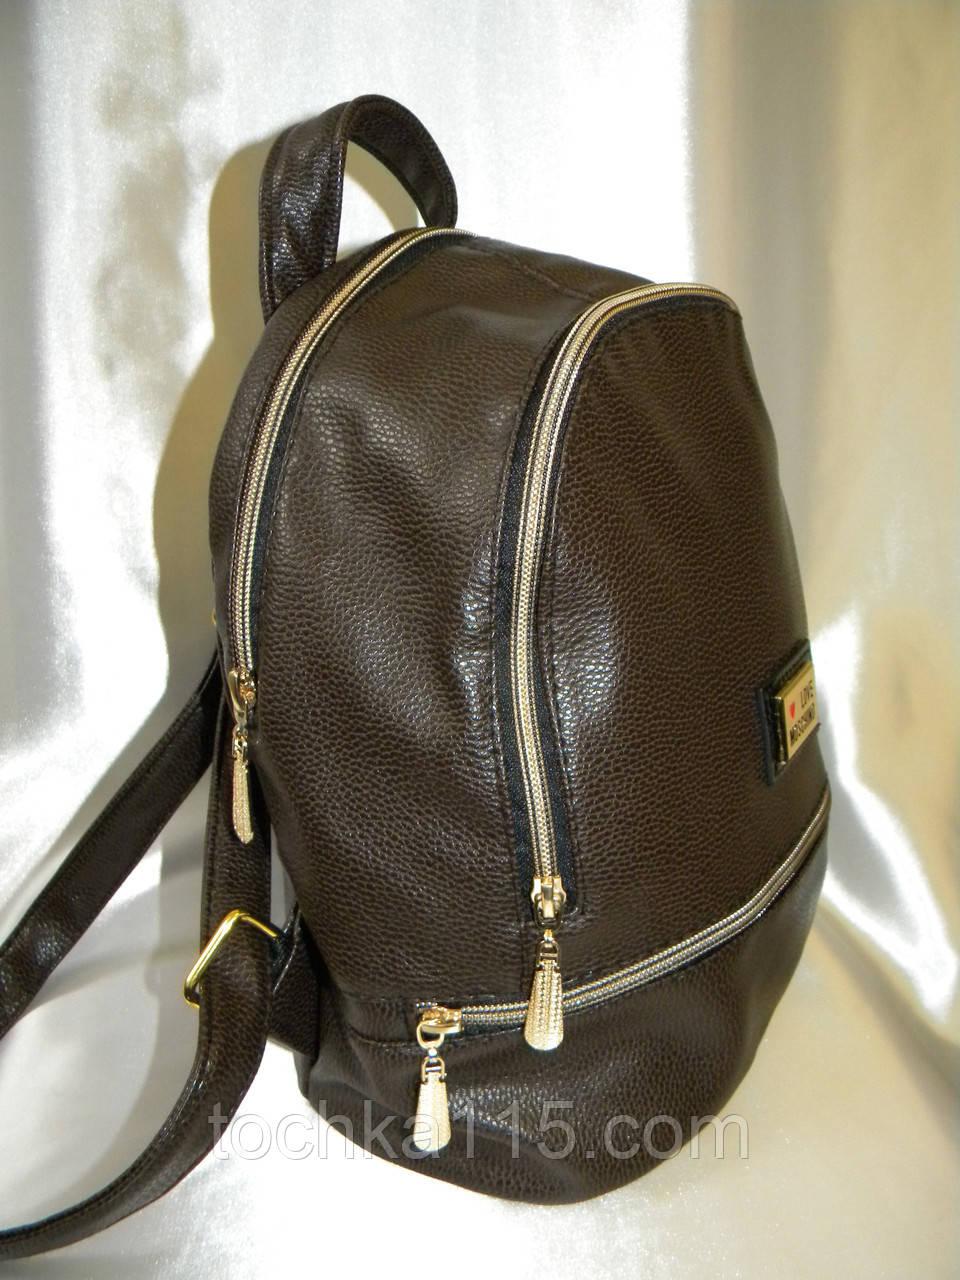 Женский кожаный рюкзак MOSCHINO коричневый реплика